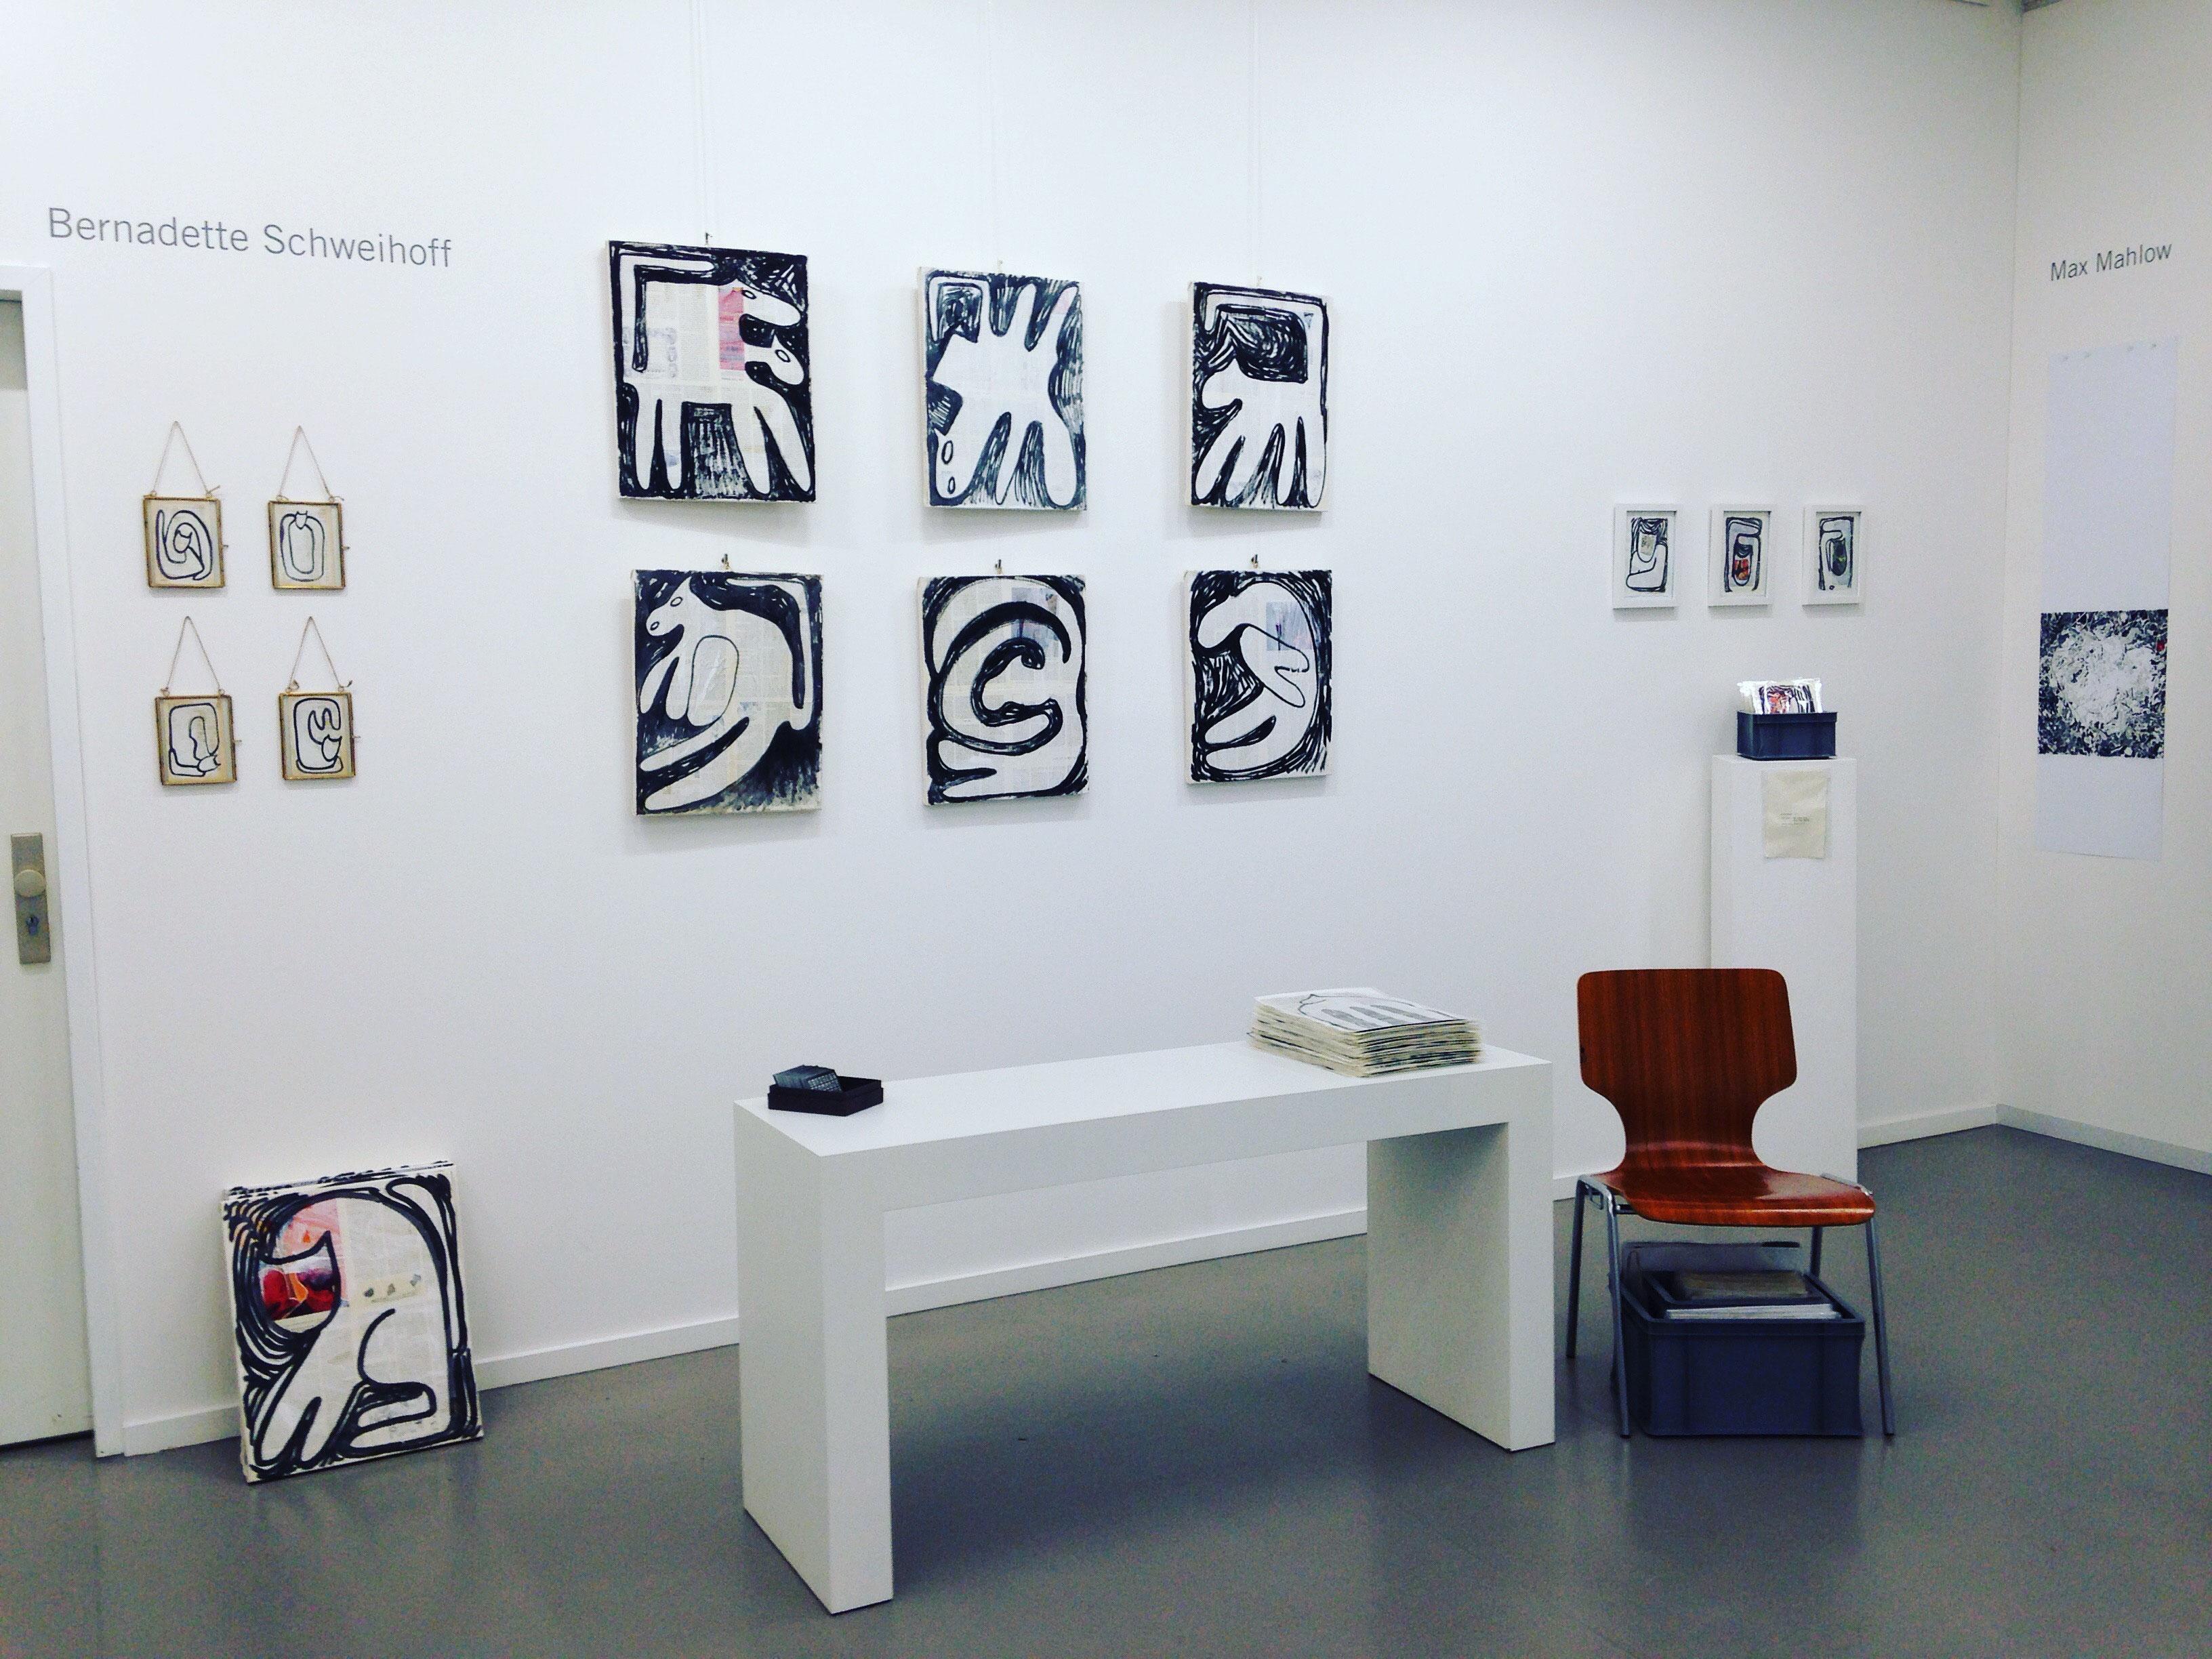 kommunale galerie berlin studio bernadette schweihoff. Black Bedroom Furniture Sets. Home Design Ideas